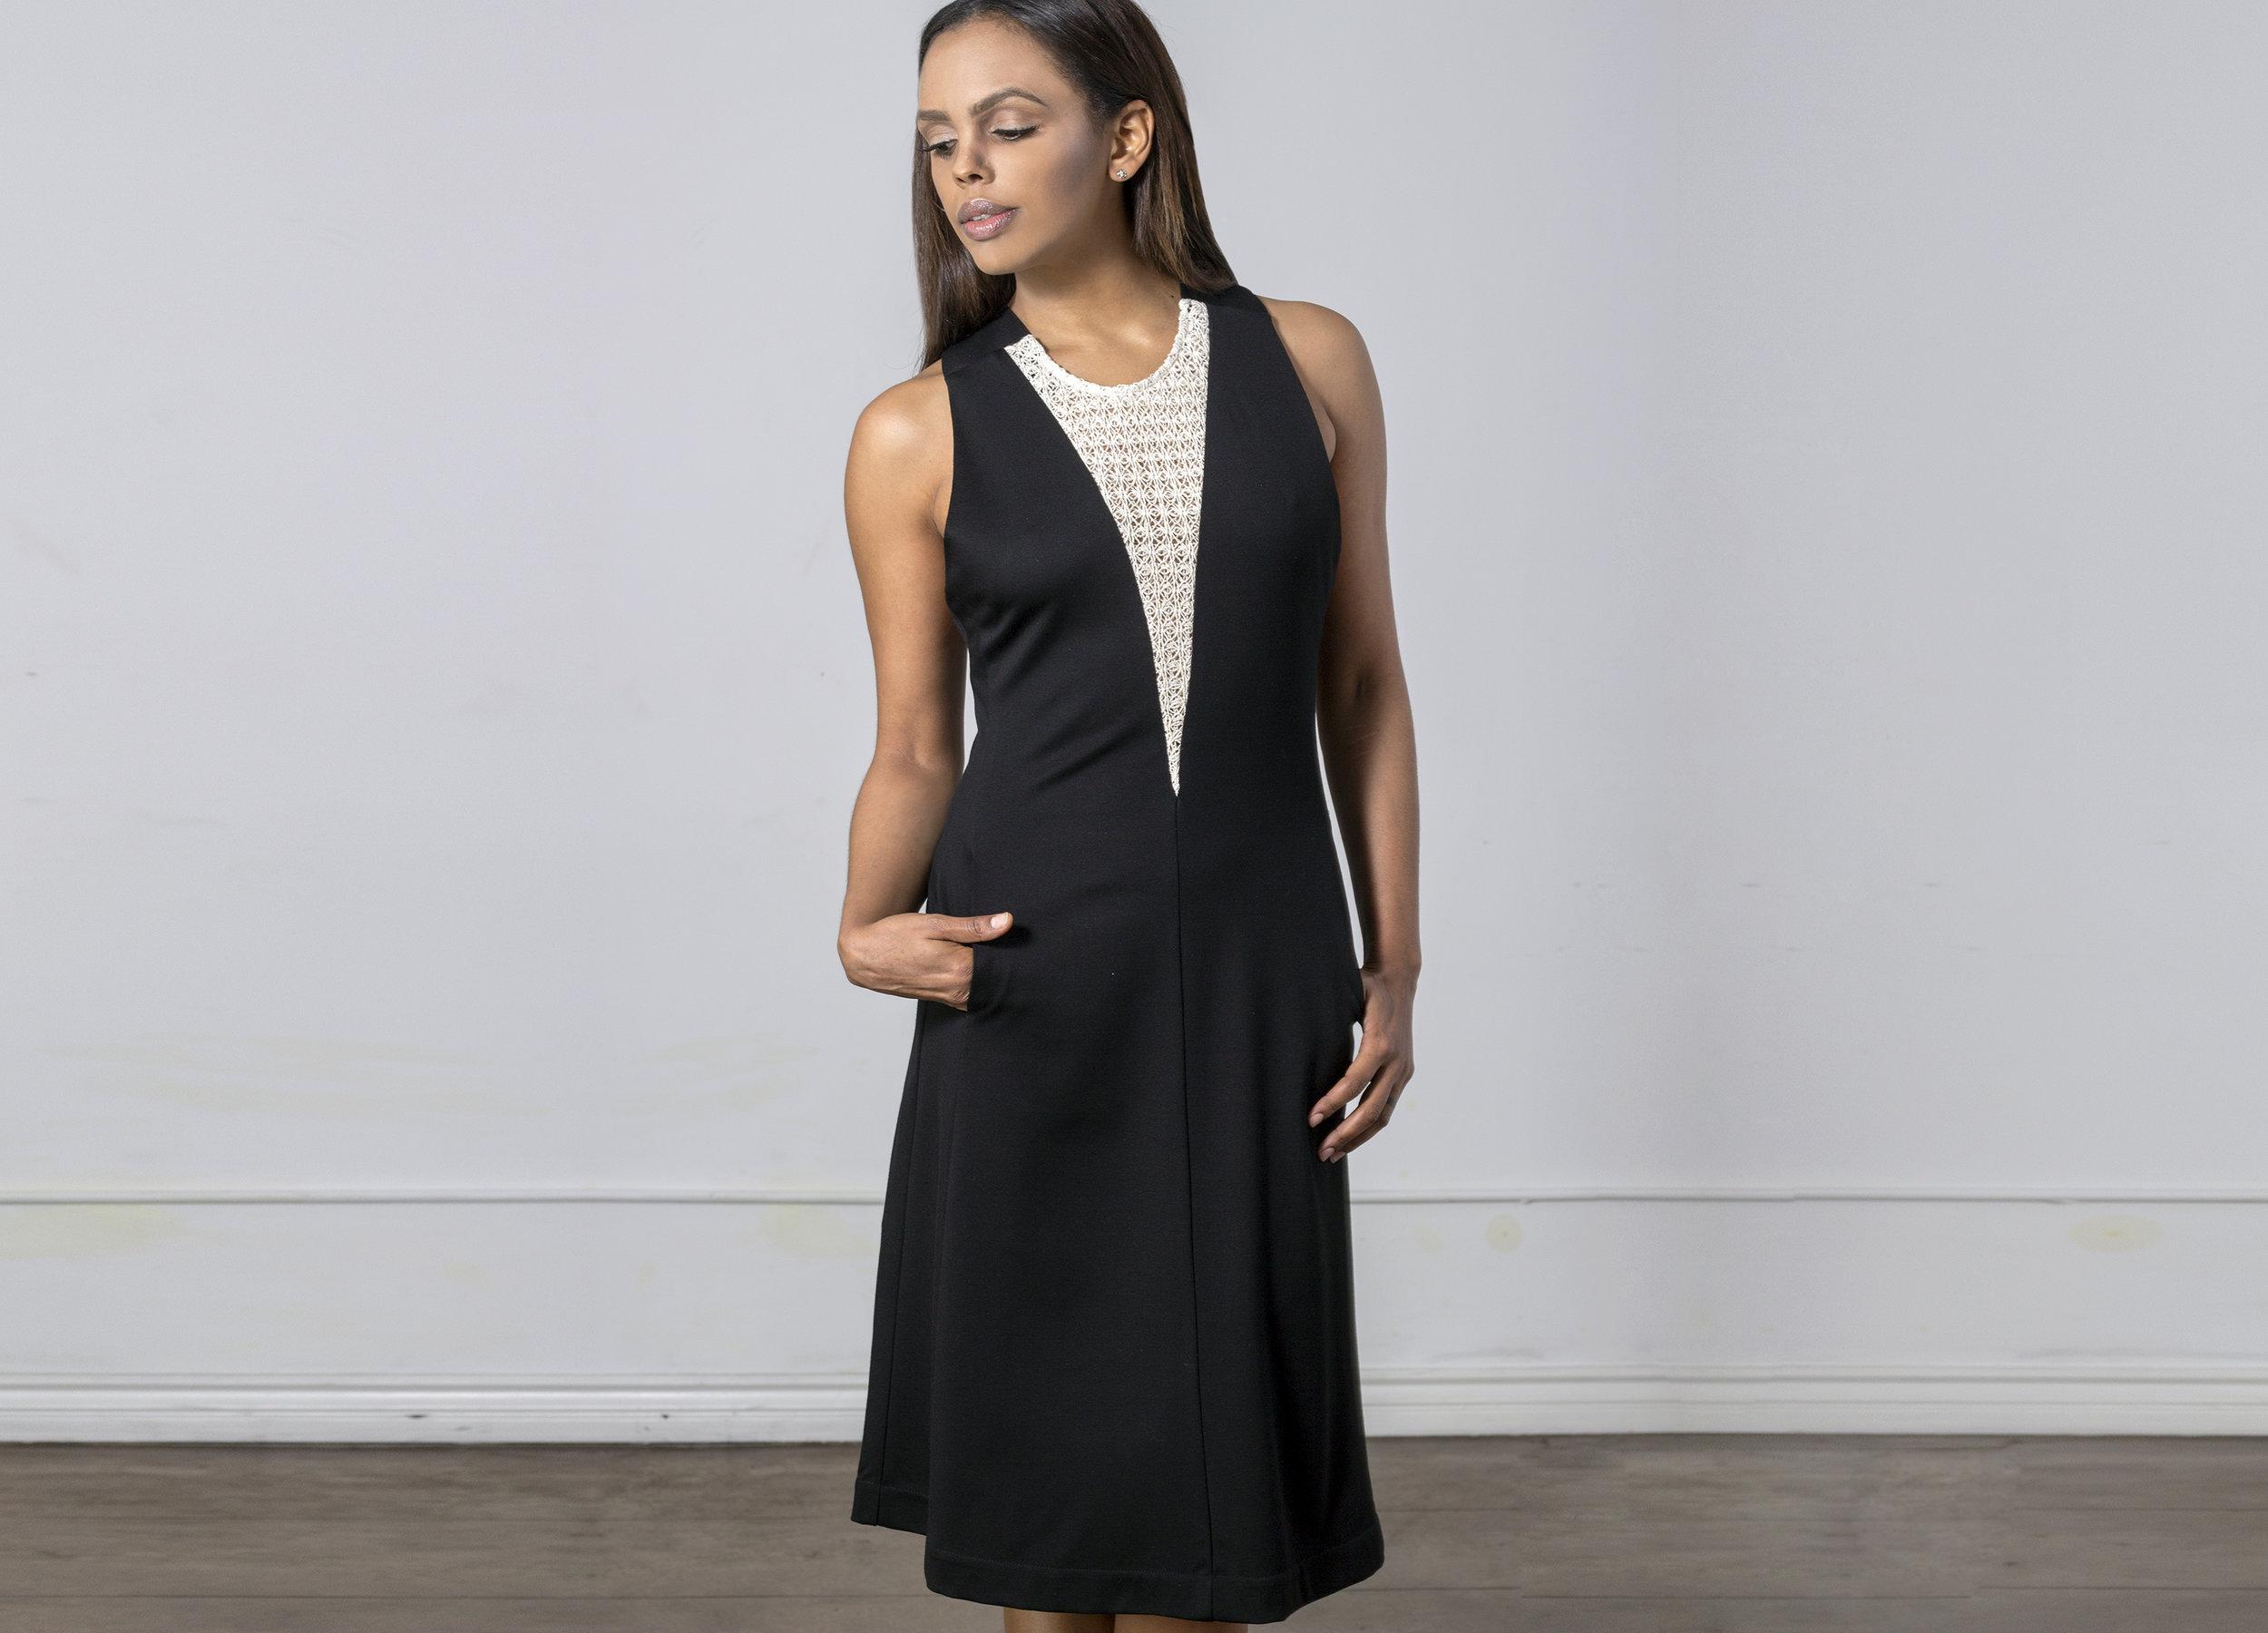 10-Jessica-Faulkner-Womens-Contemporary-Clothing-Macrame-Midi-Dress.jpg